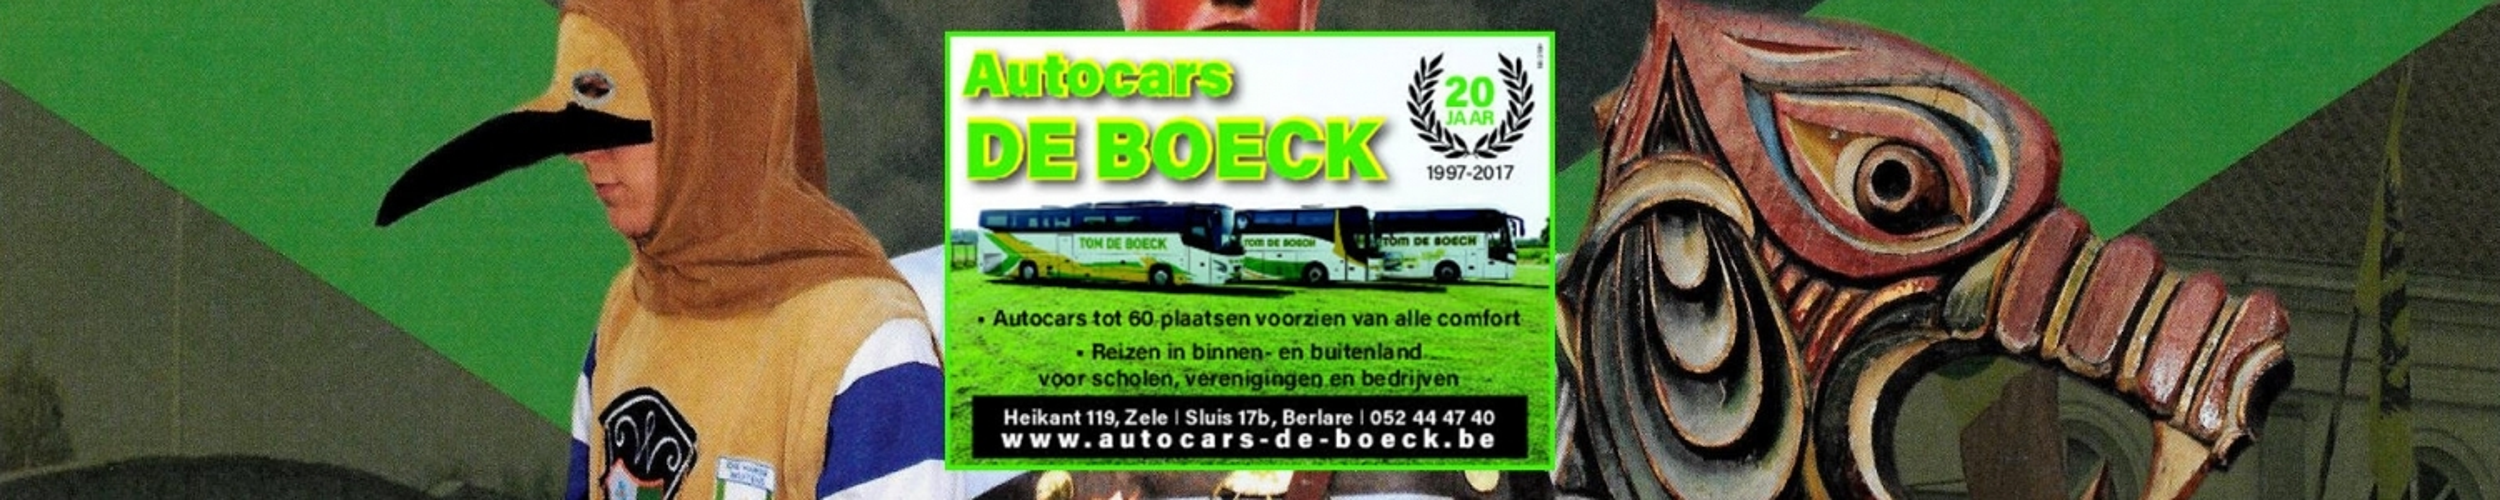 Autocars Tom De Boeck